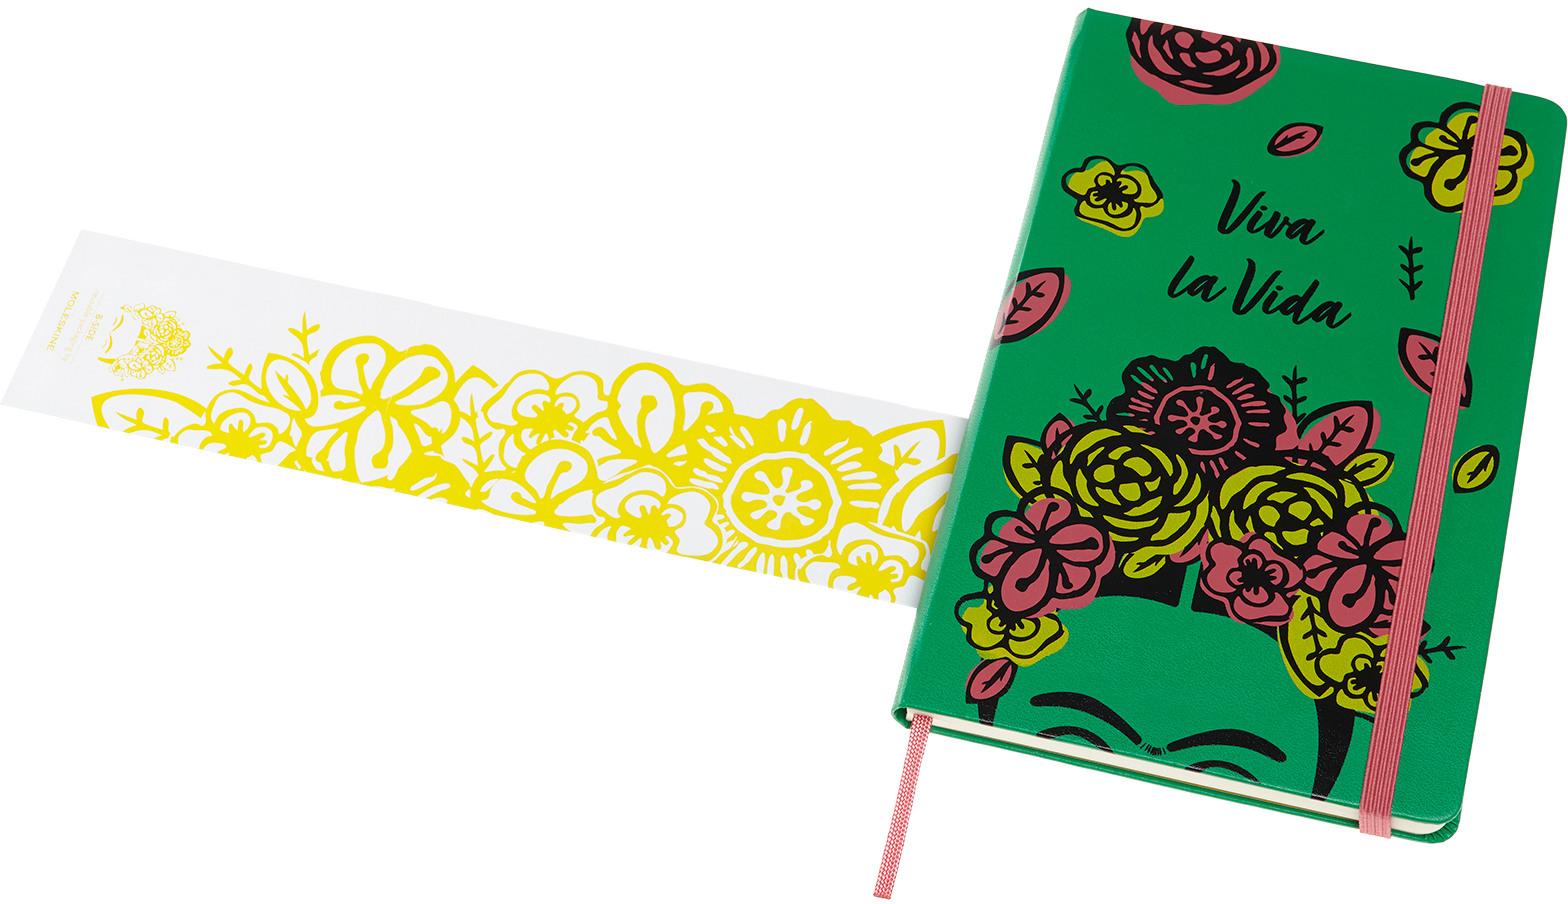 Moleskine Notizbuch - Frida Kahlo, Large/A5, Liniert, Fester Einband, Grün